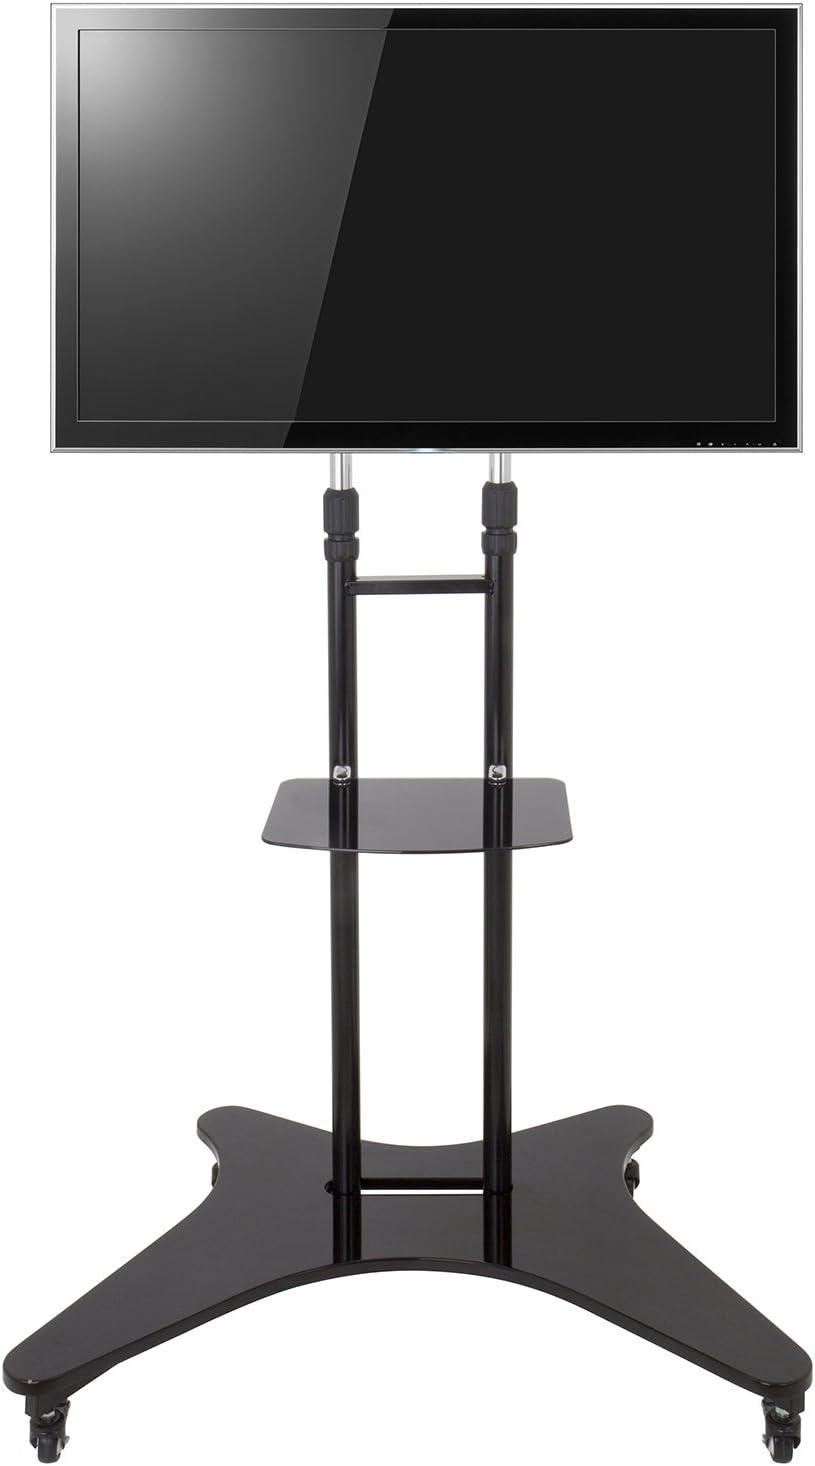 King Universal Mobile TV Carrito con Ruedas Altura Ajustable a 188 cm de 32